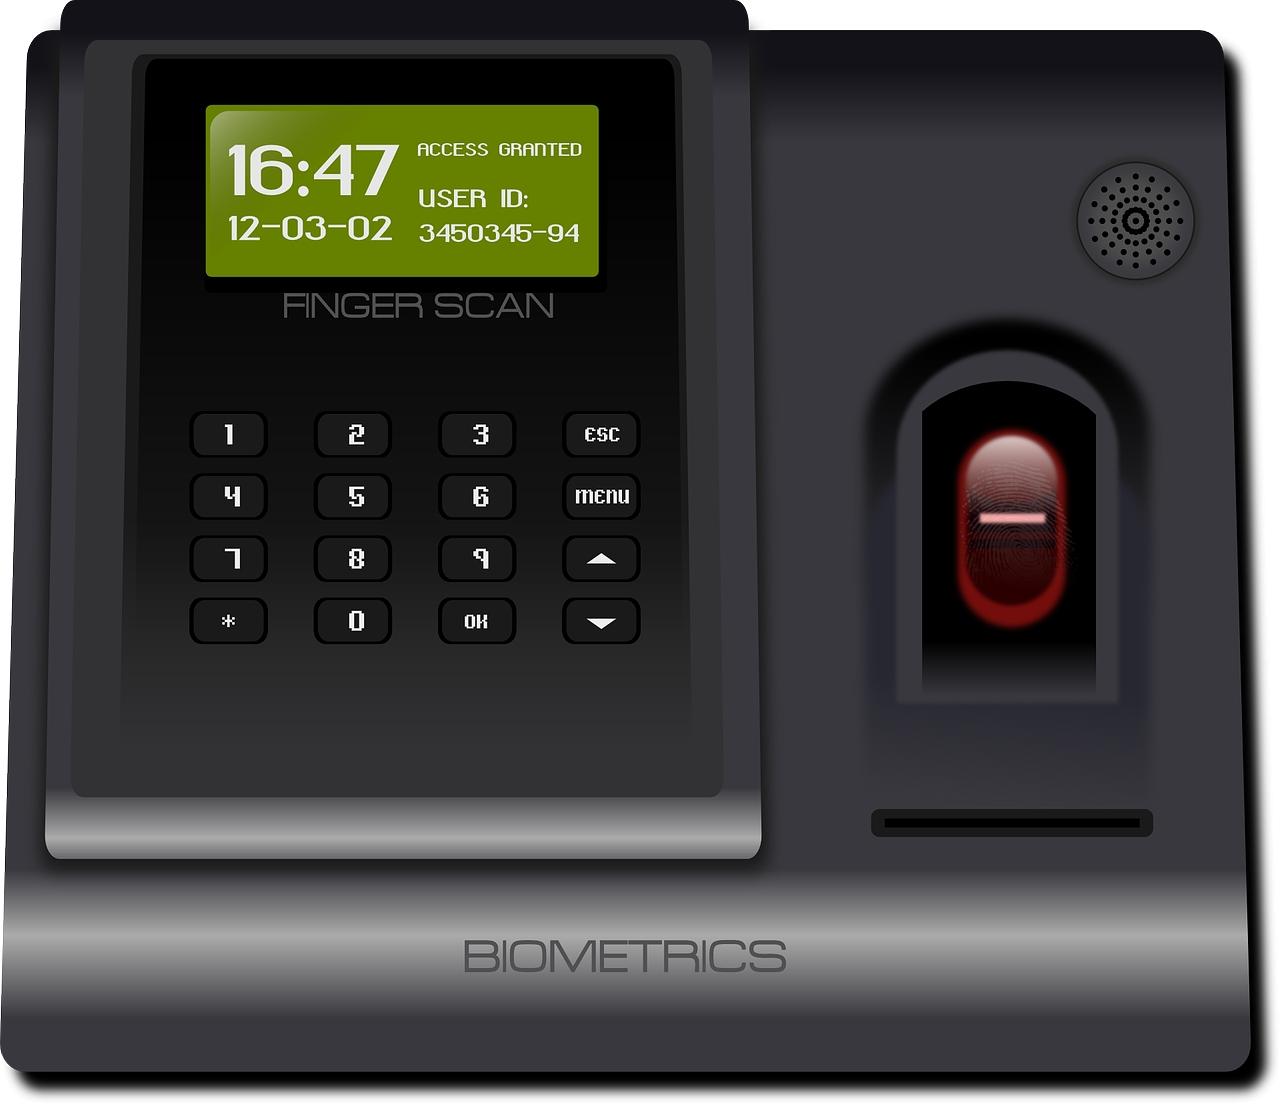 Biometrics - 154662 - 1280